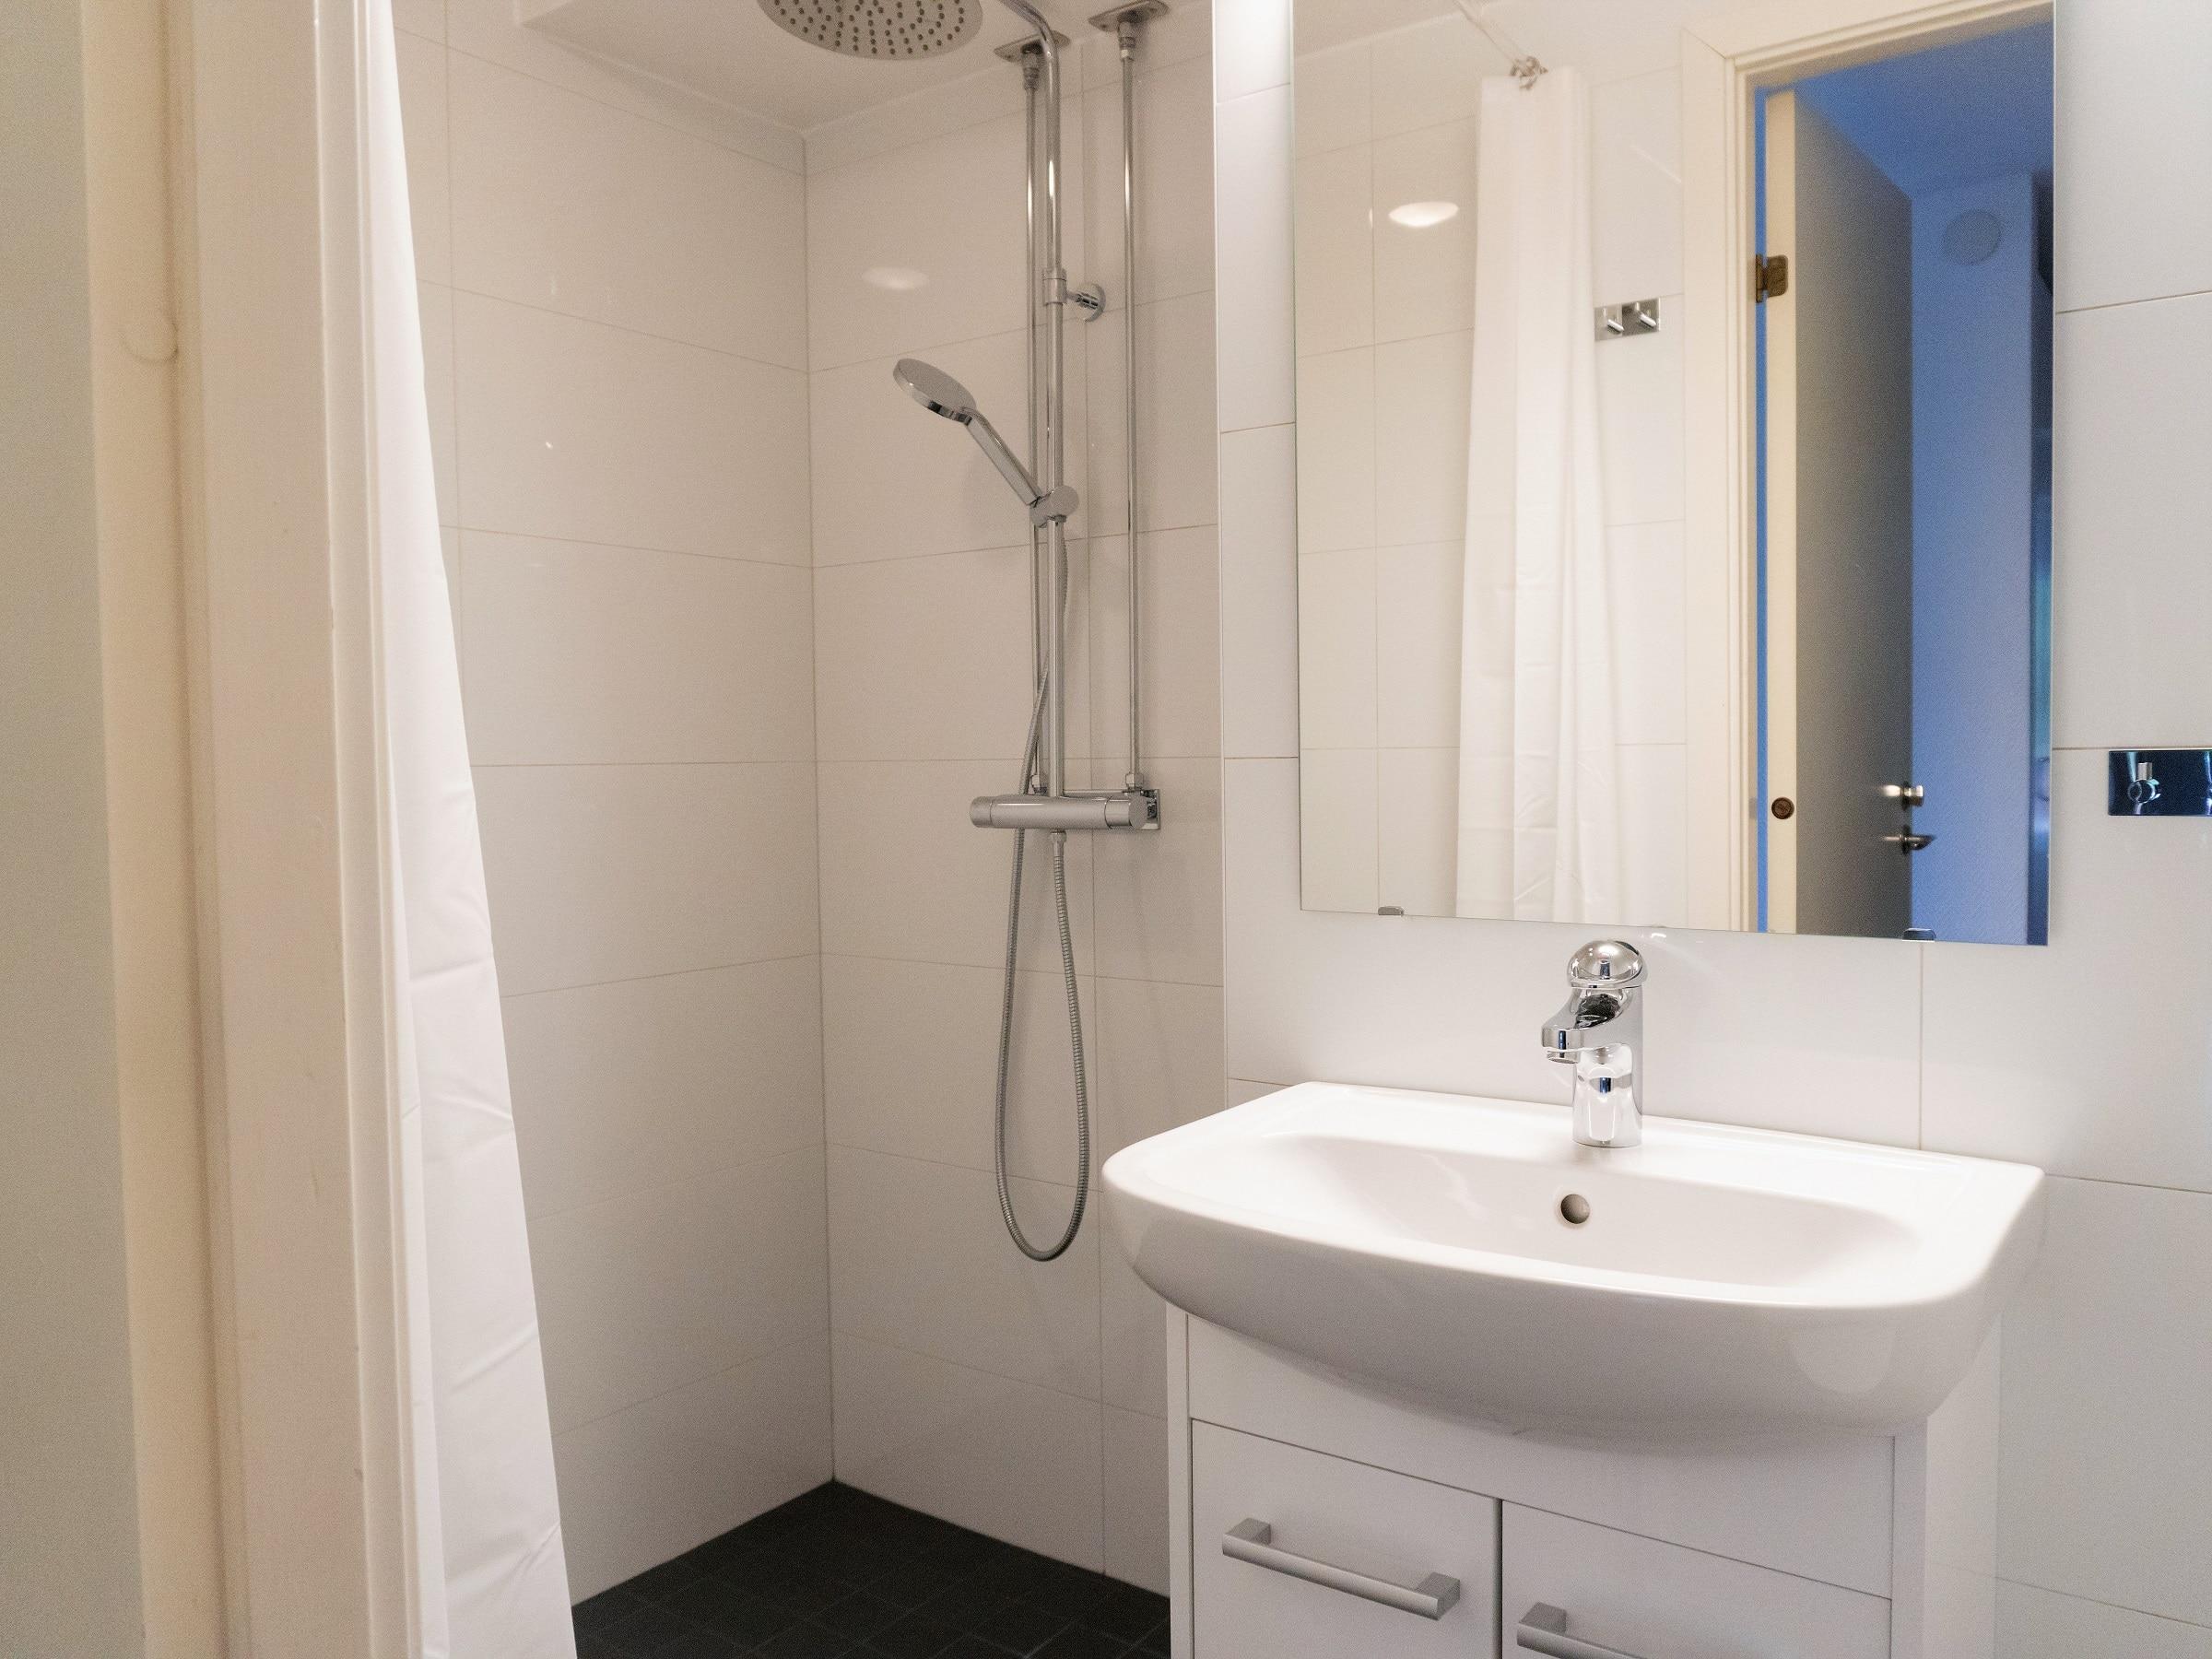 Tiled bathroom in Hummeln in Åre